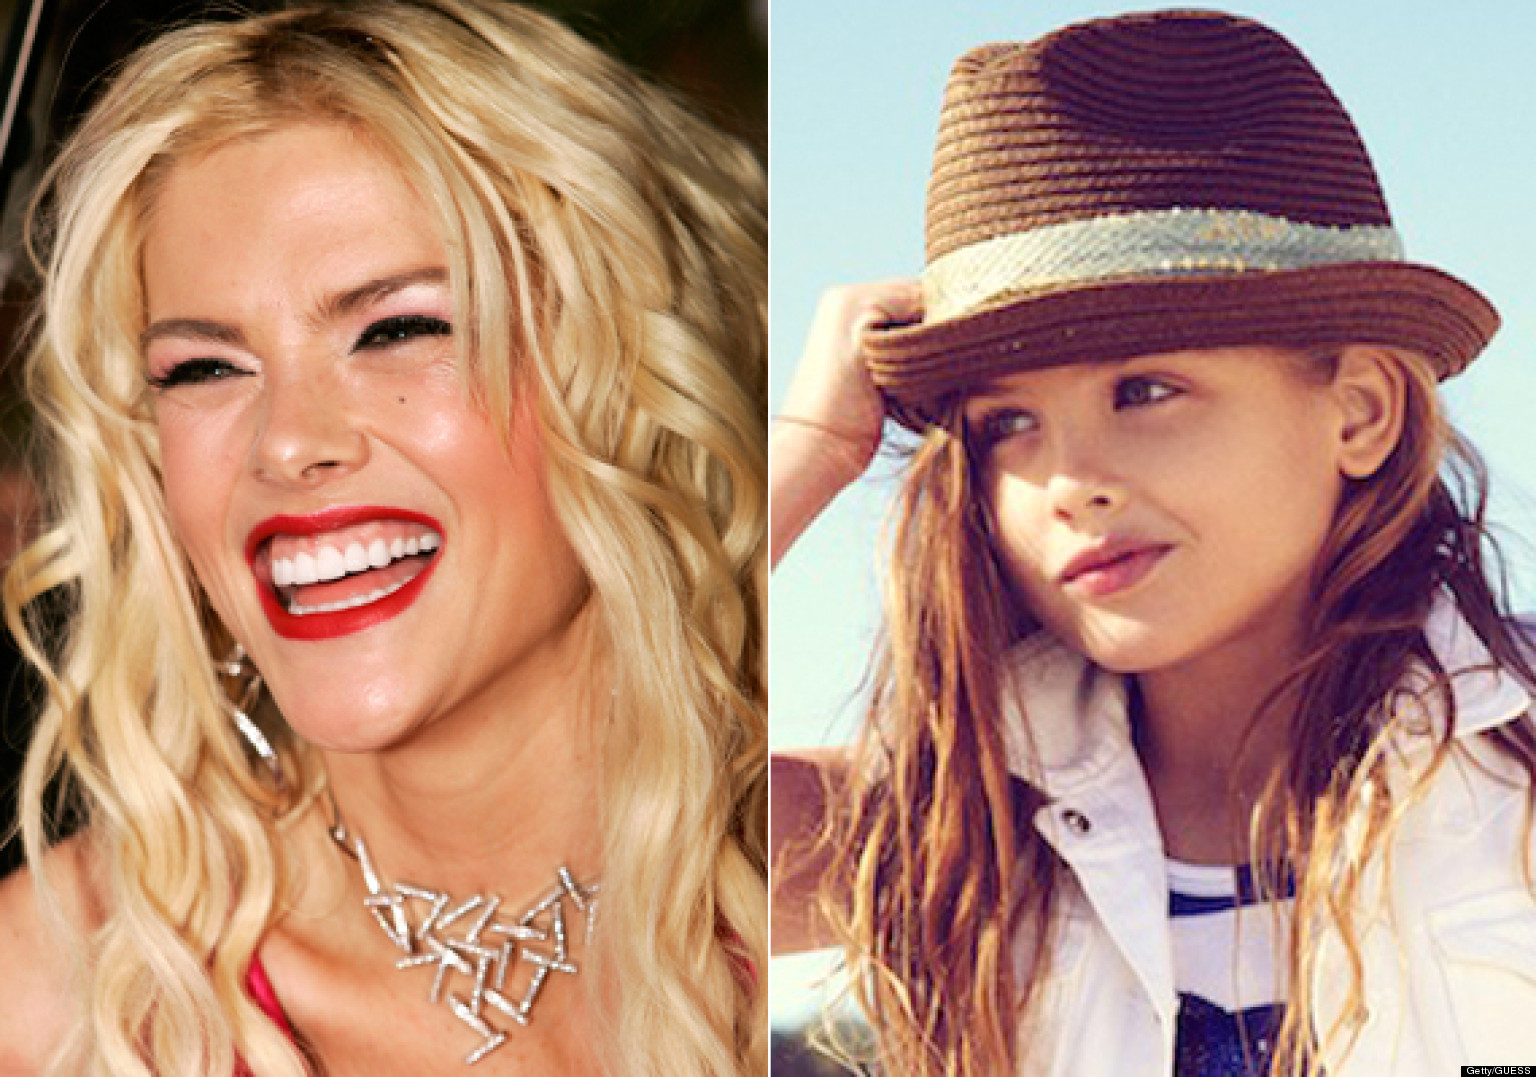 Anna Nicole Smith Daughter Dannielynn Birkhead